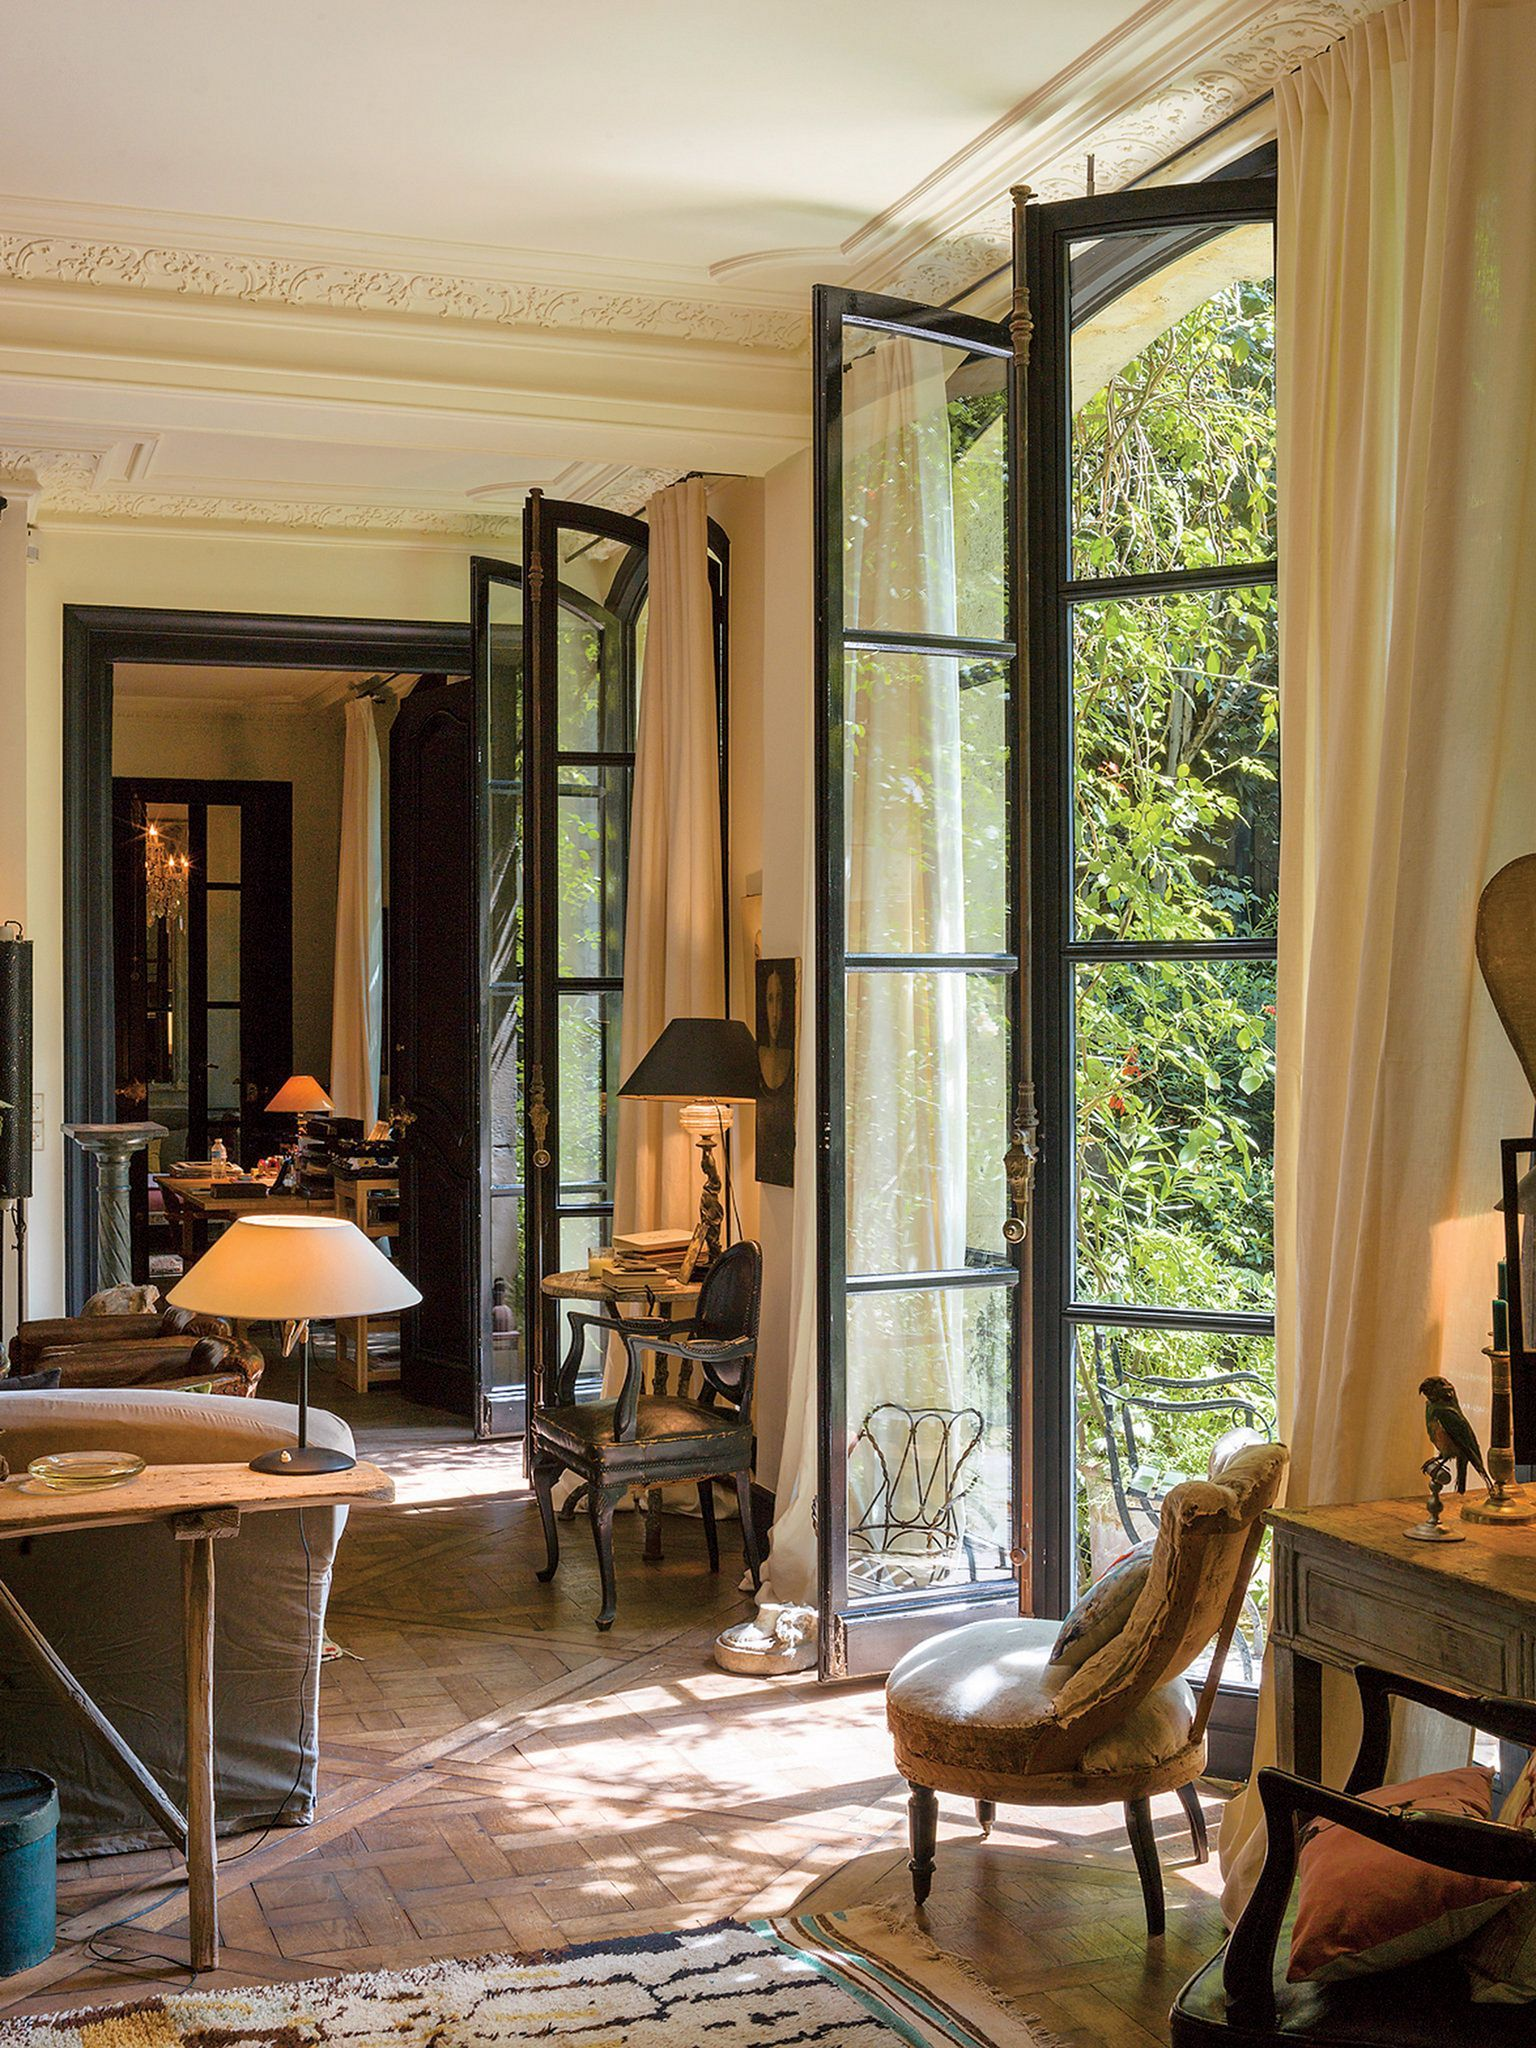 French Style Living Room: 40+ Best Black And White Interior Design Ideas / FresHOUZ